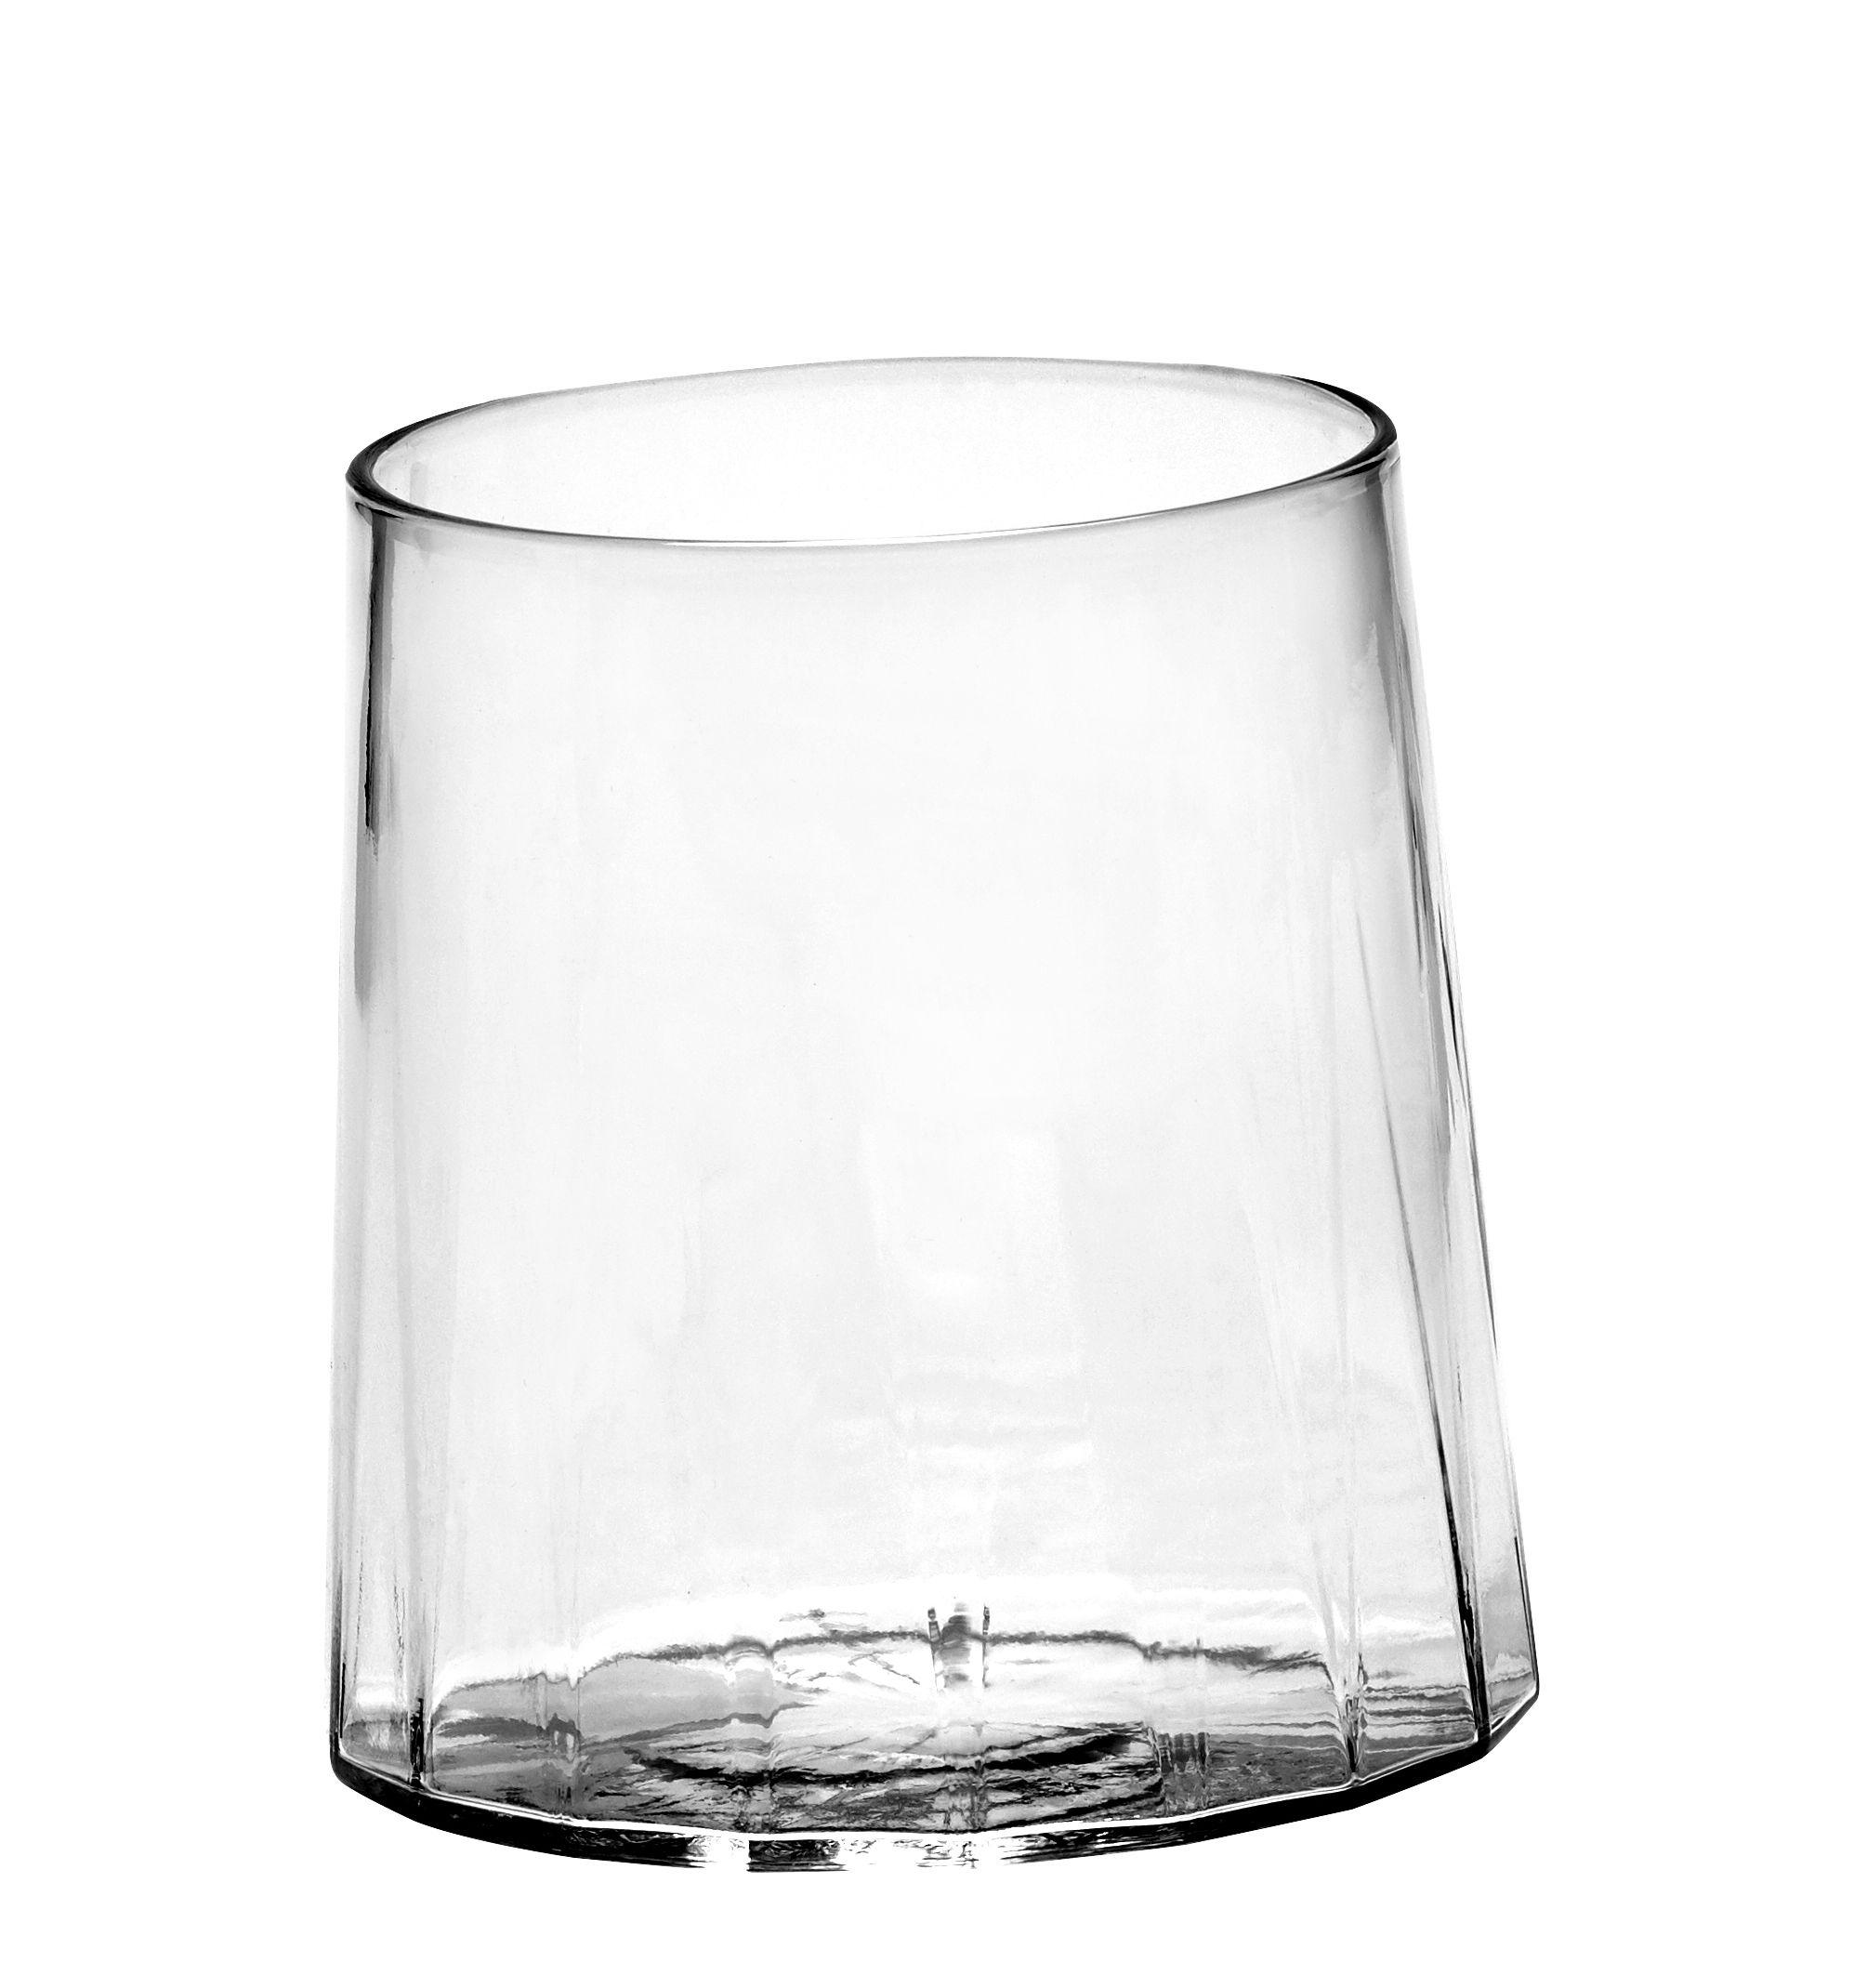 Tavola - Bicchieri  - Bicchiere da acqua San Pellegrino di Serax - Trasparente - Vetro